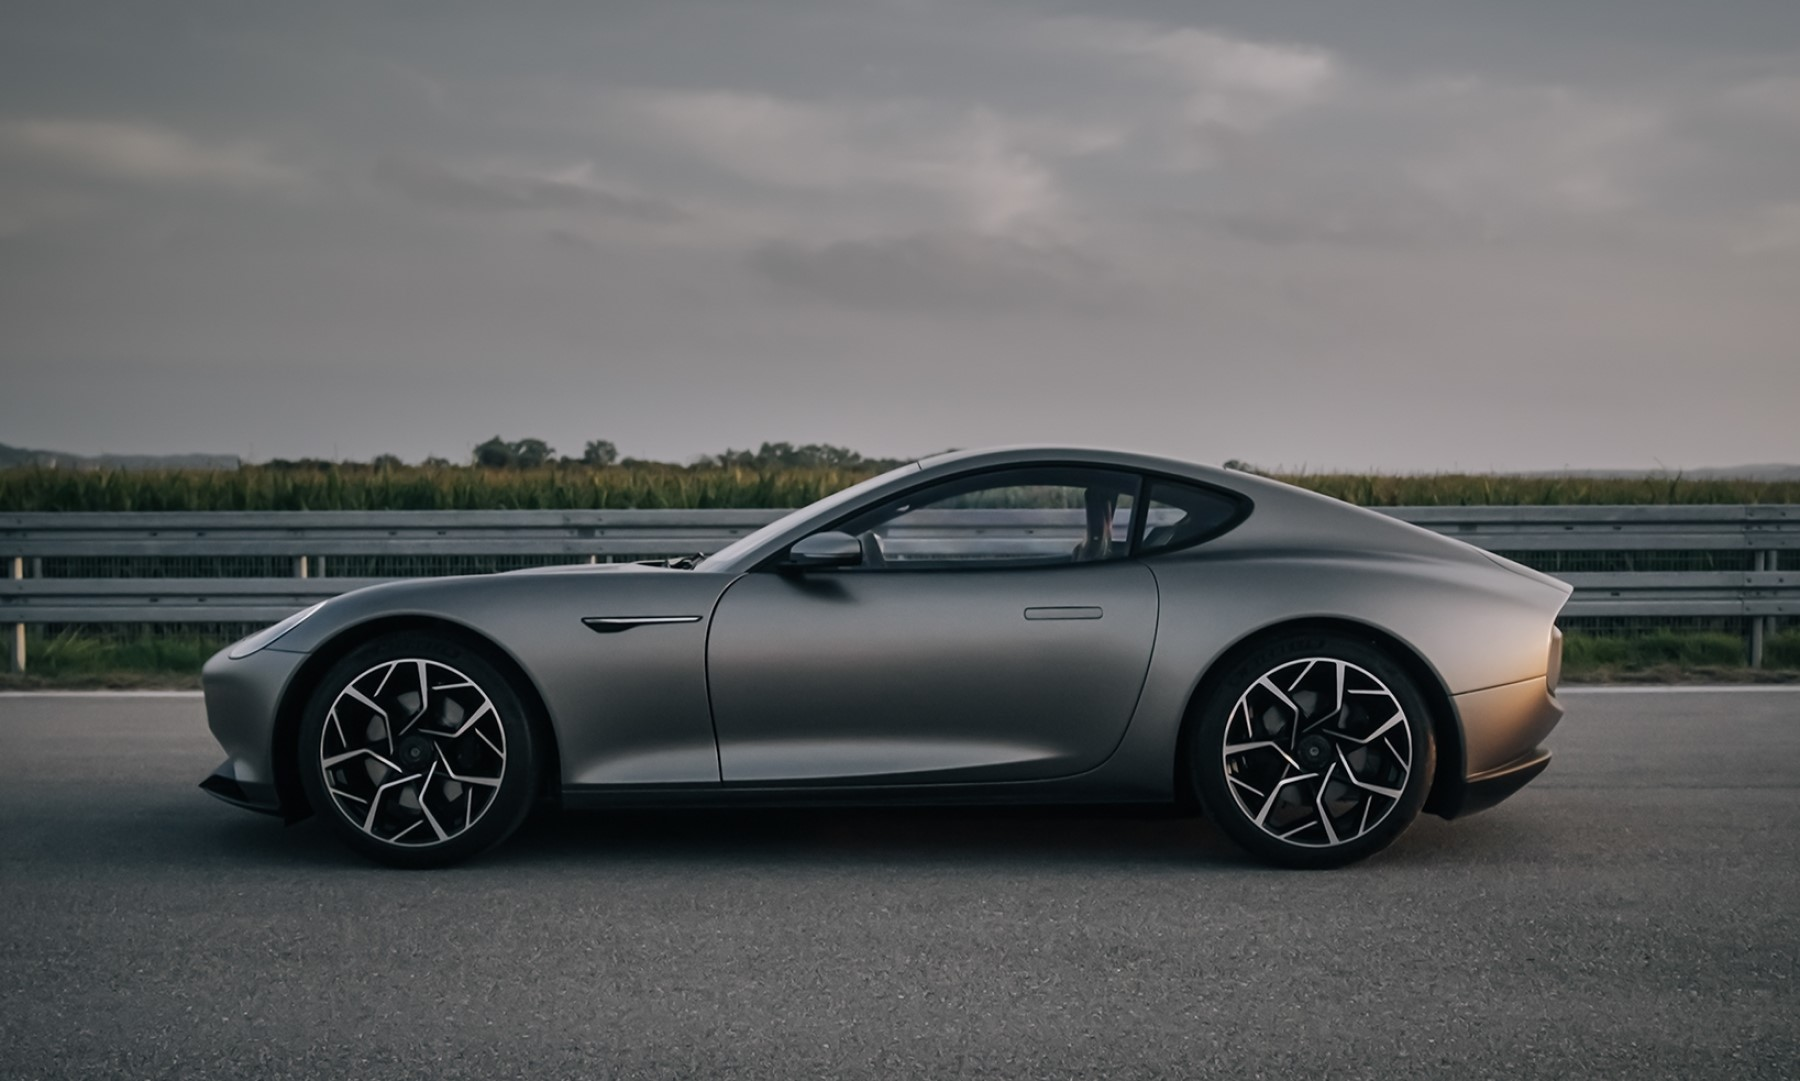 Piech GT EV profile